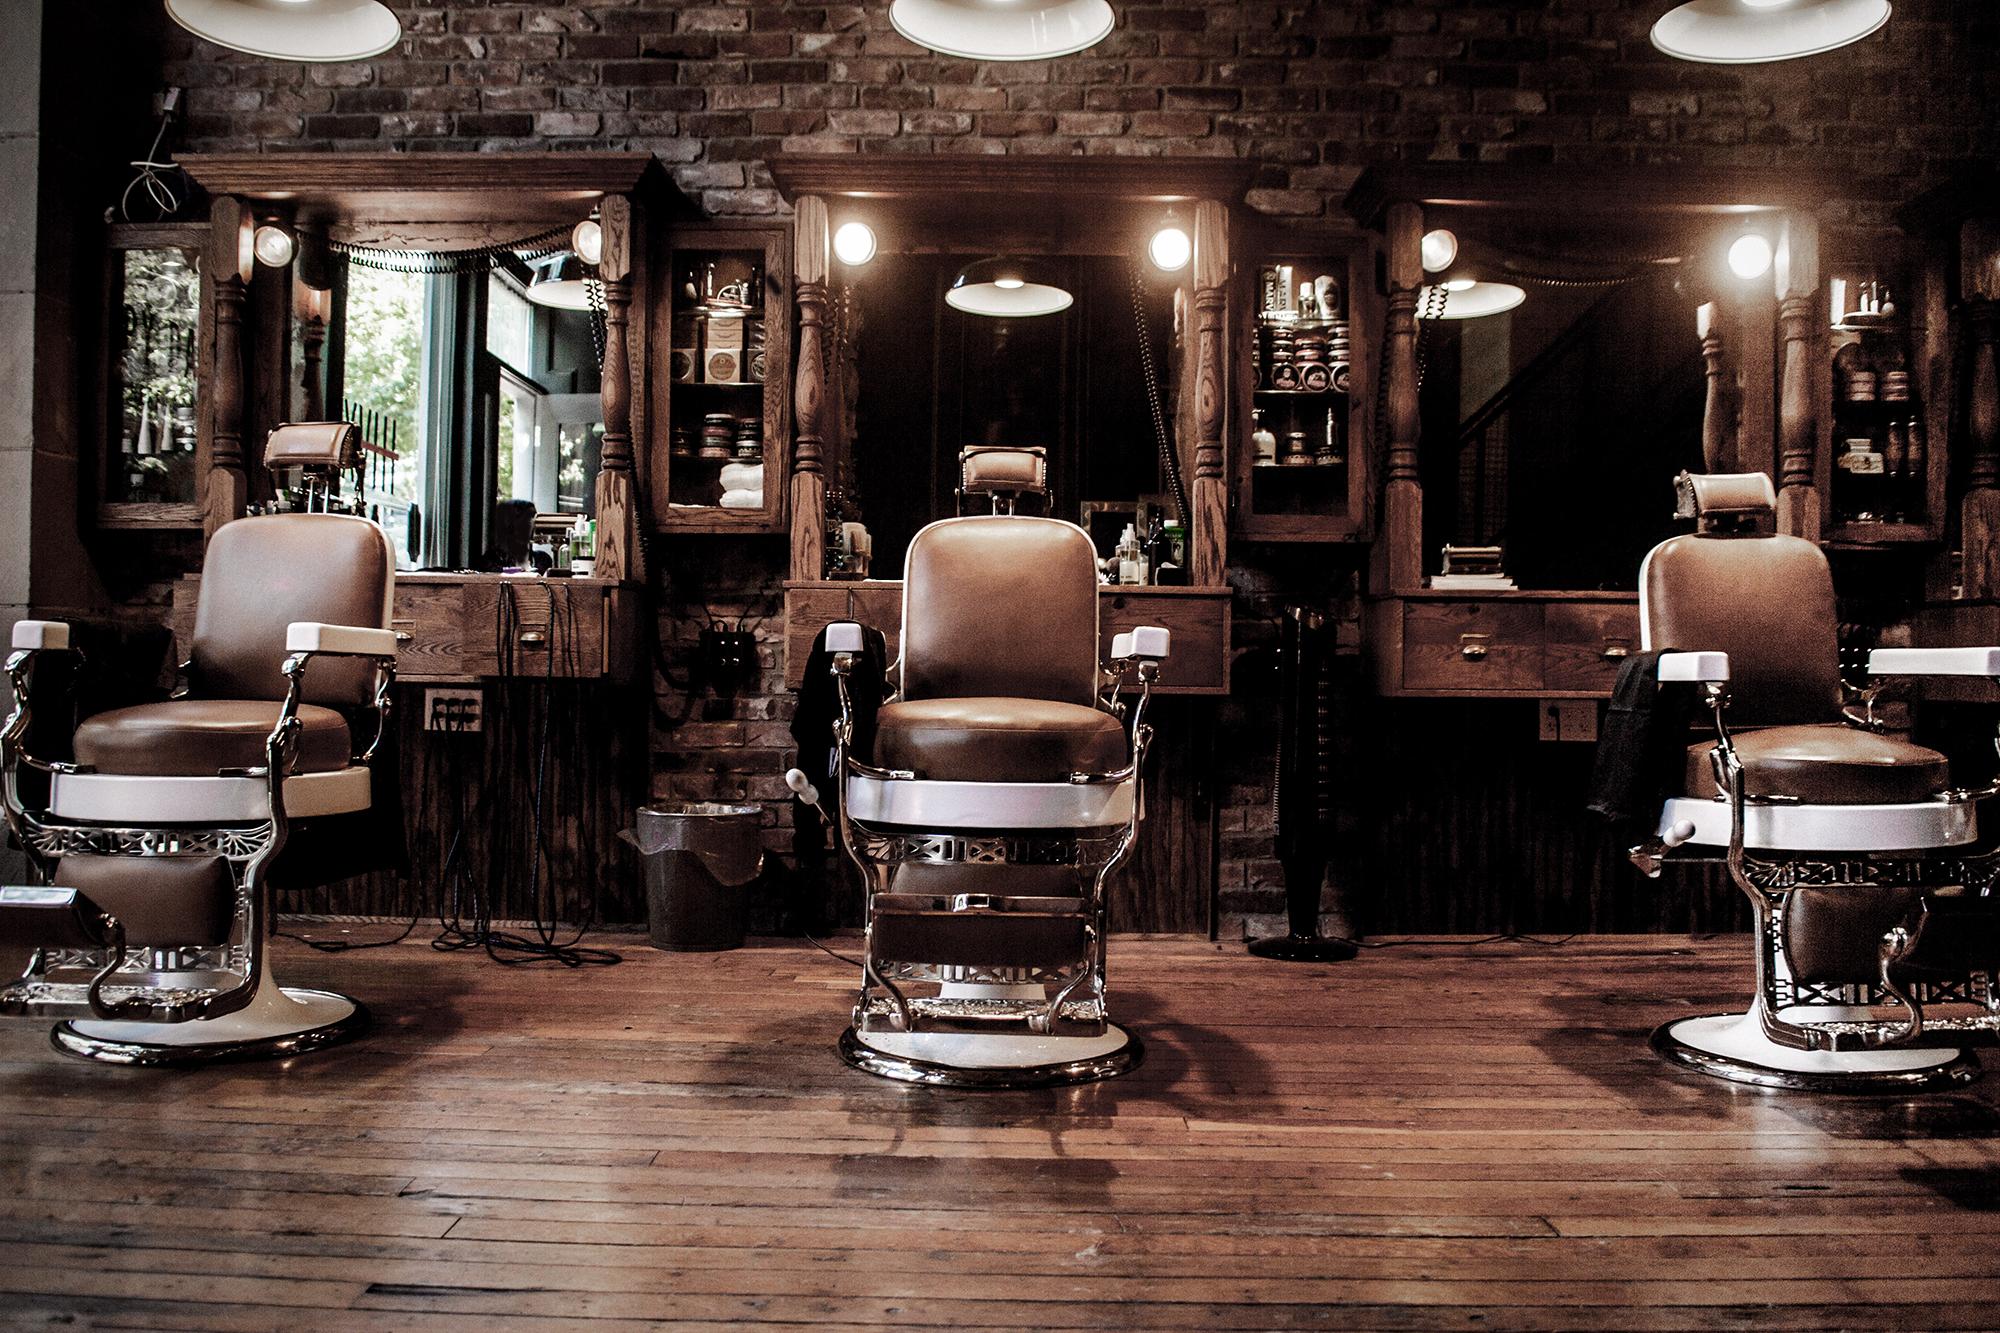 Barbershops in Saigon